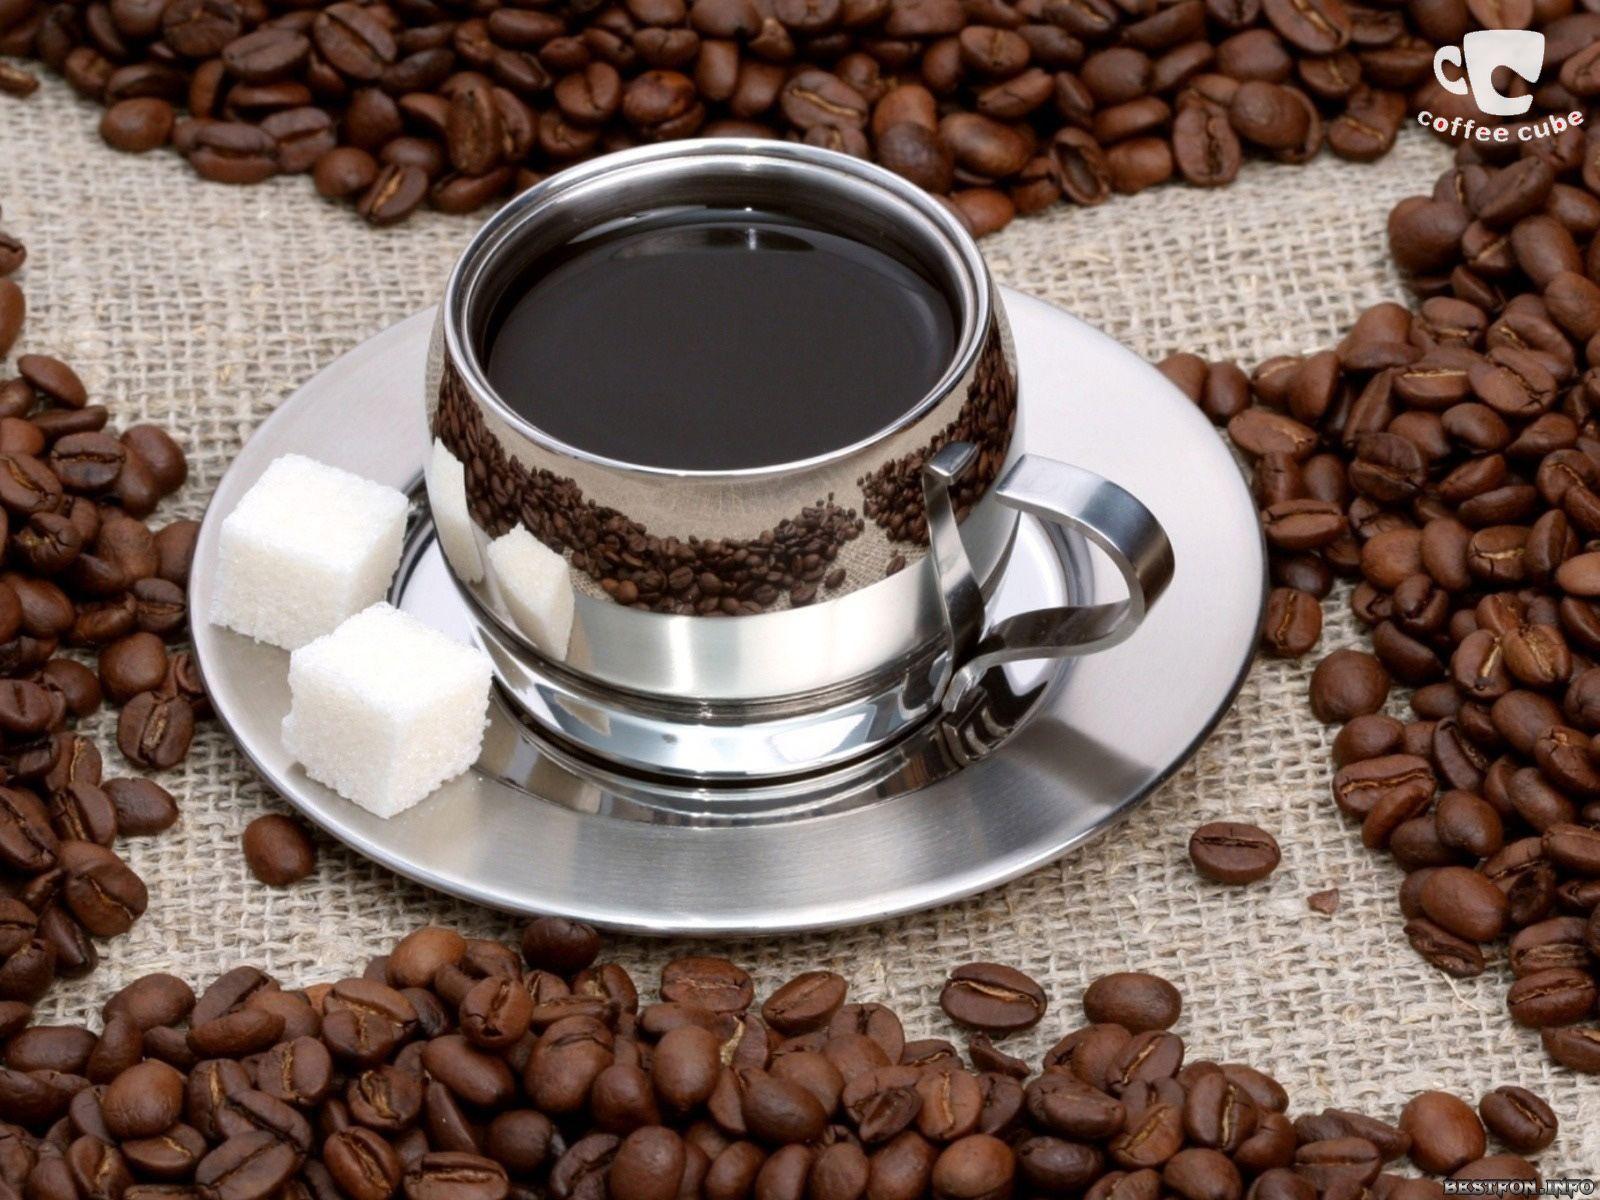 Get that good coffee feeling.